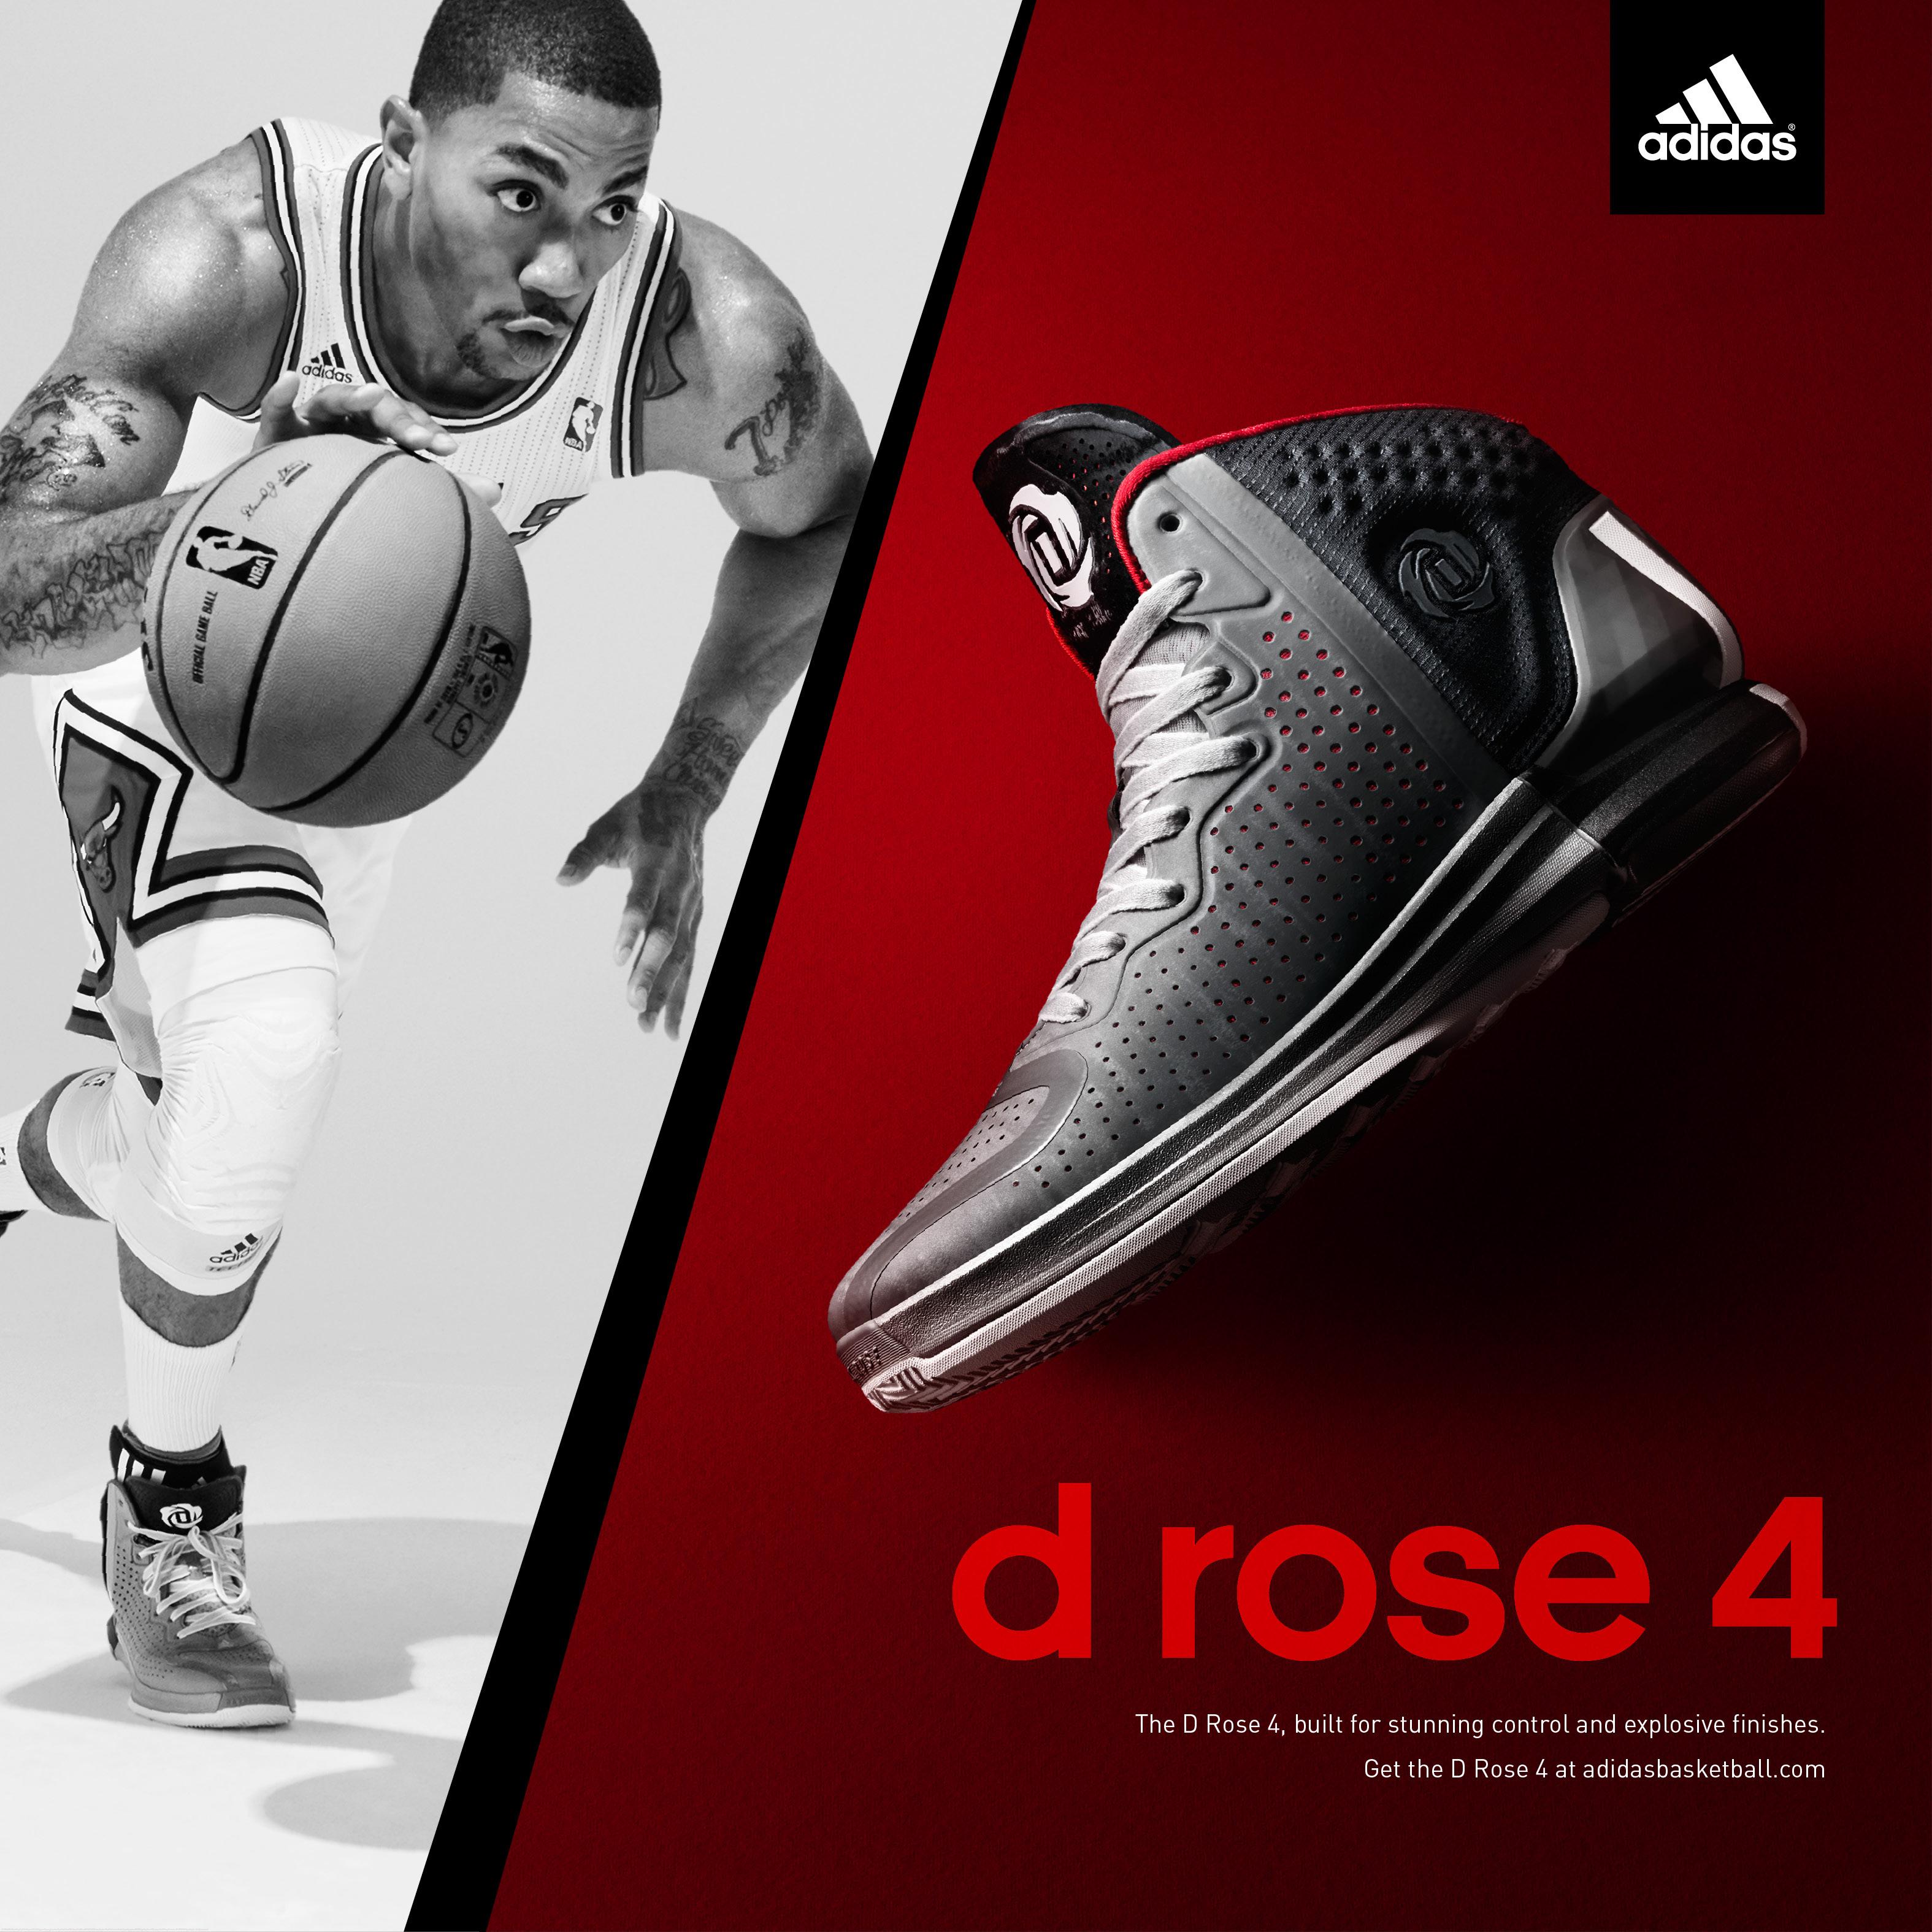 adidas d rose campaign